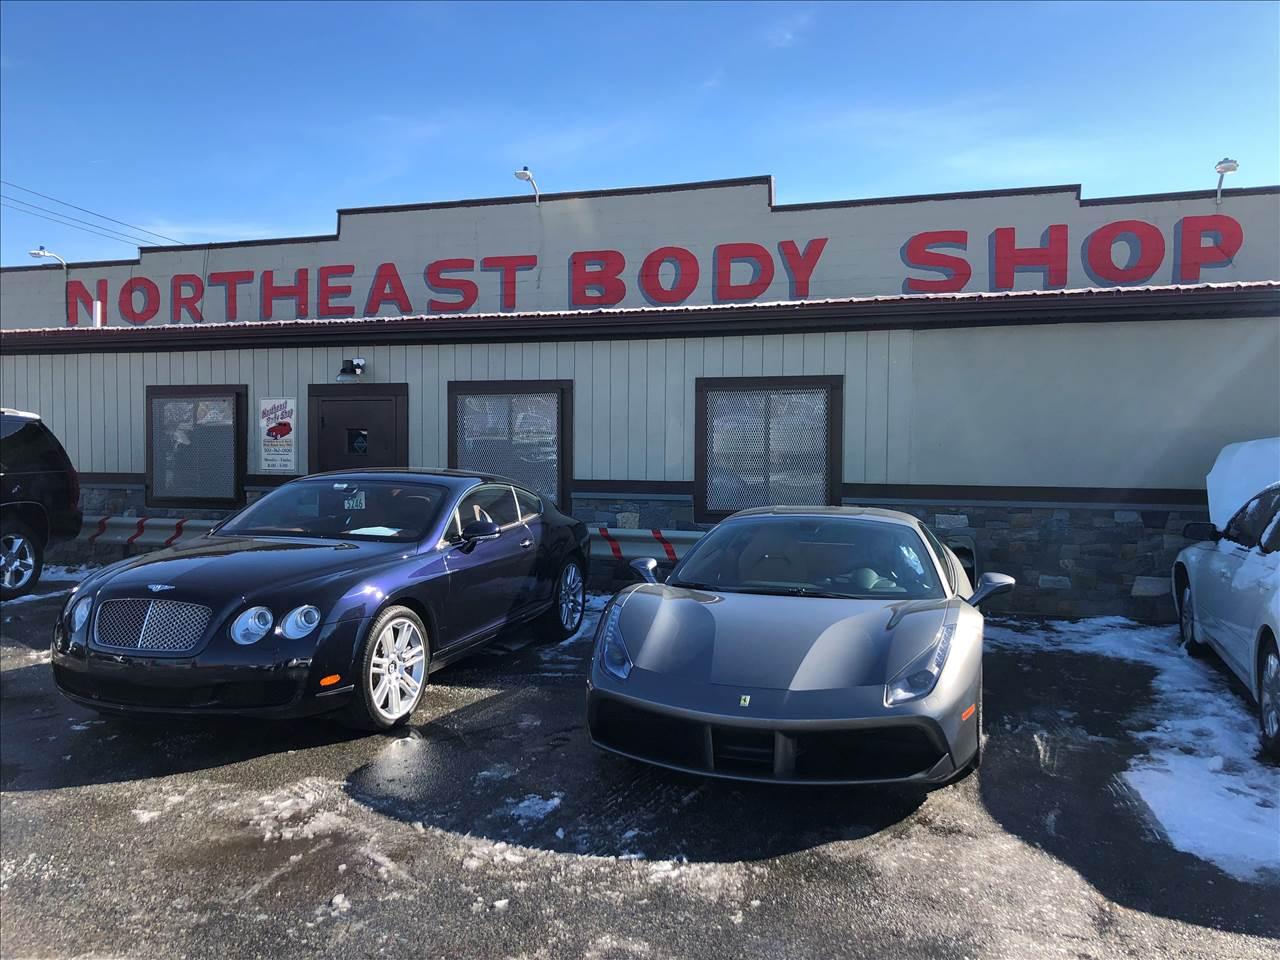 Auto Body Shops >> Northeast Body Shop In Wilmington De 19802 Auto Body